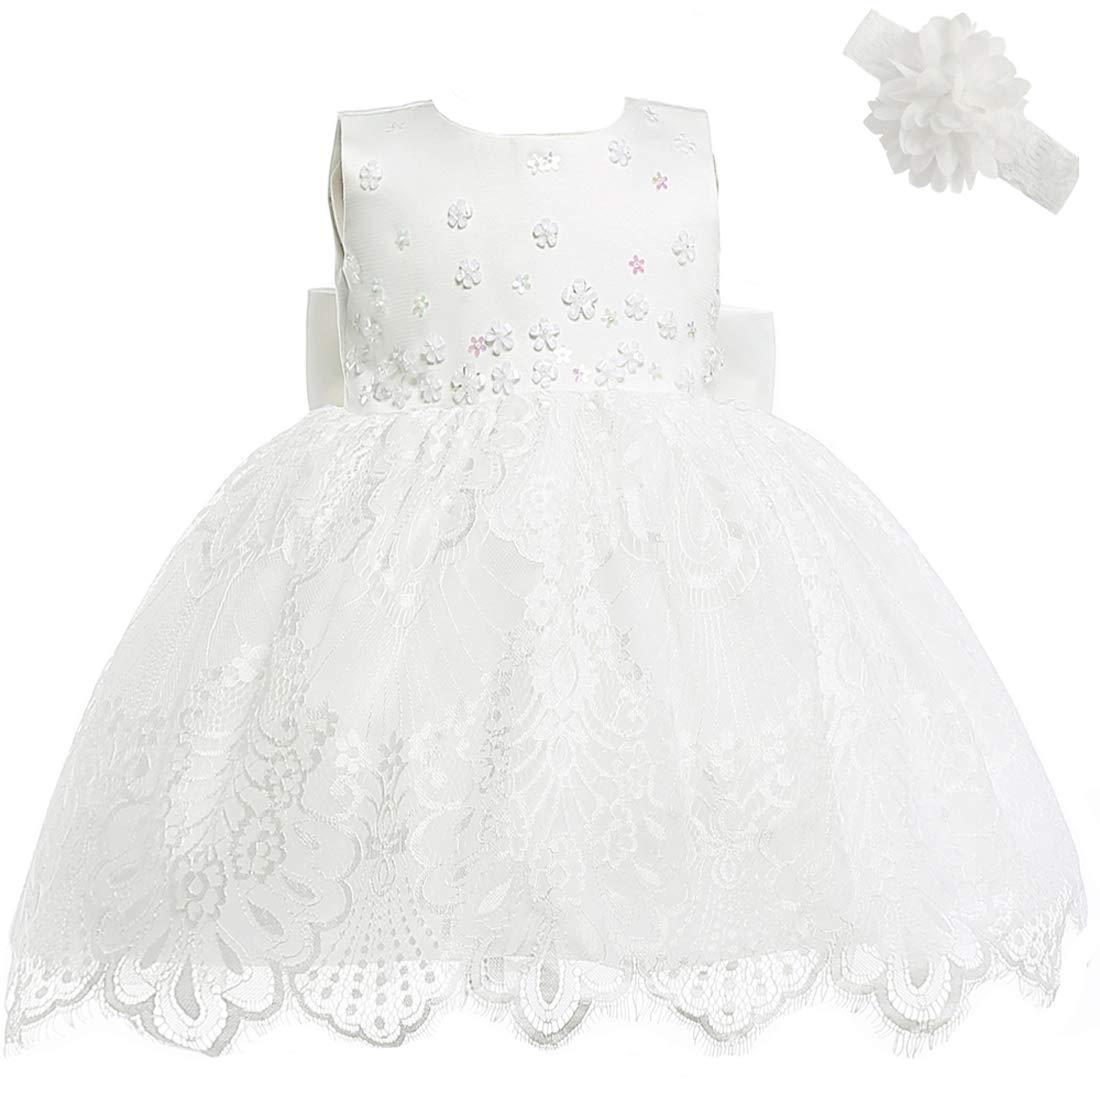 AHAHA Abiti da Sposa Principessa Neonata Battesimo Vestitino